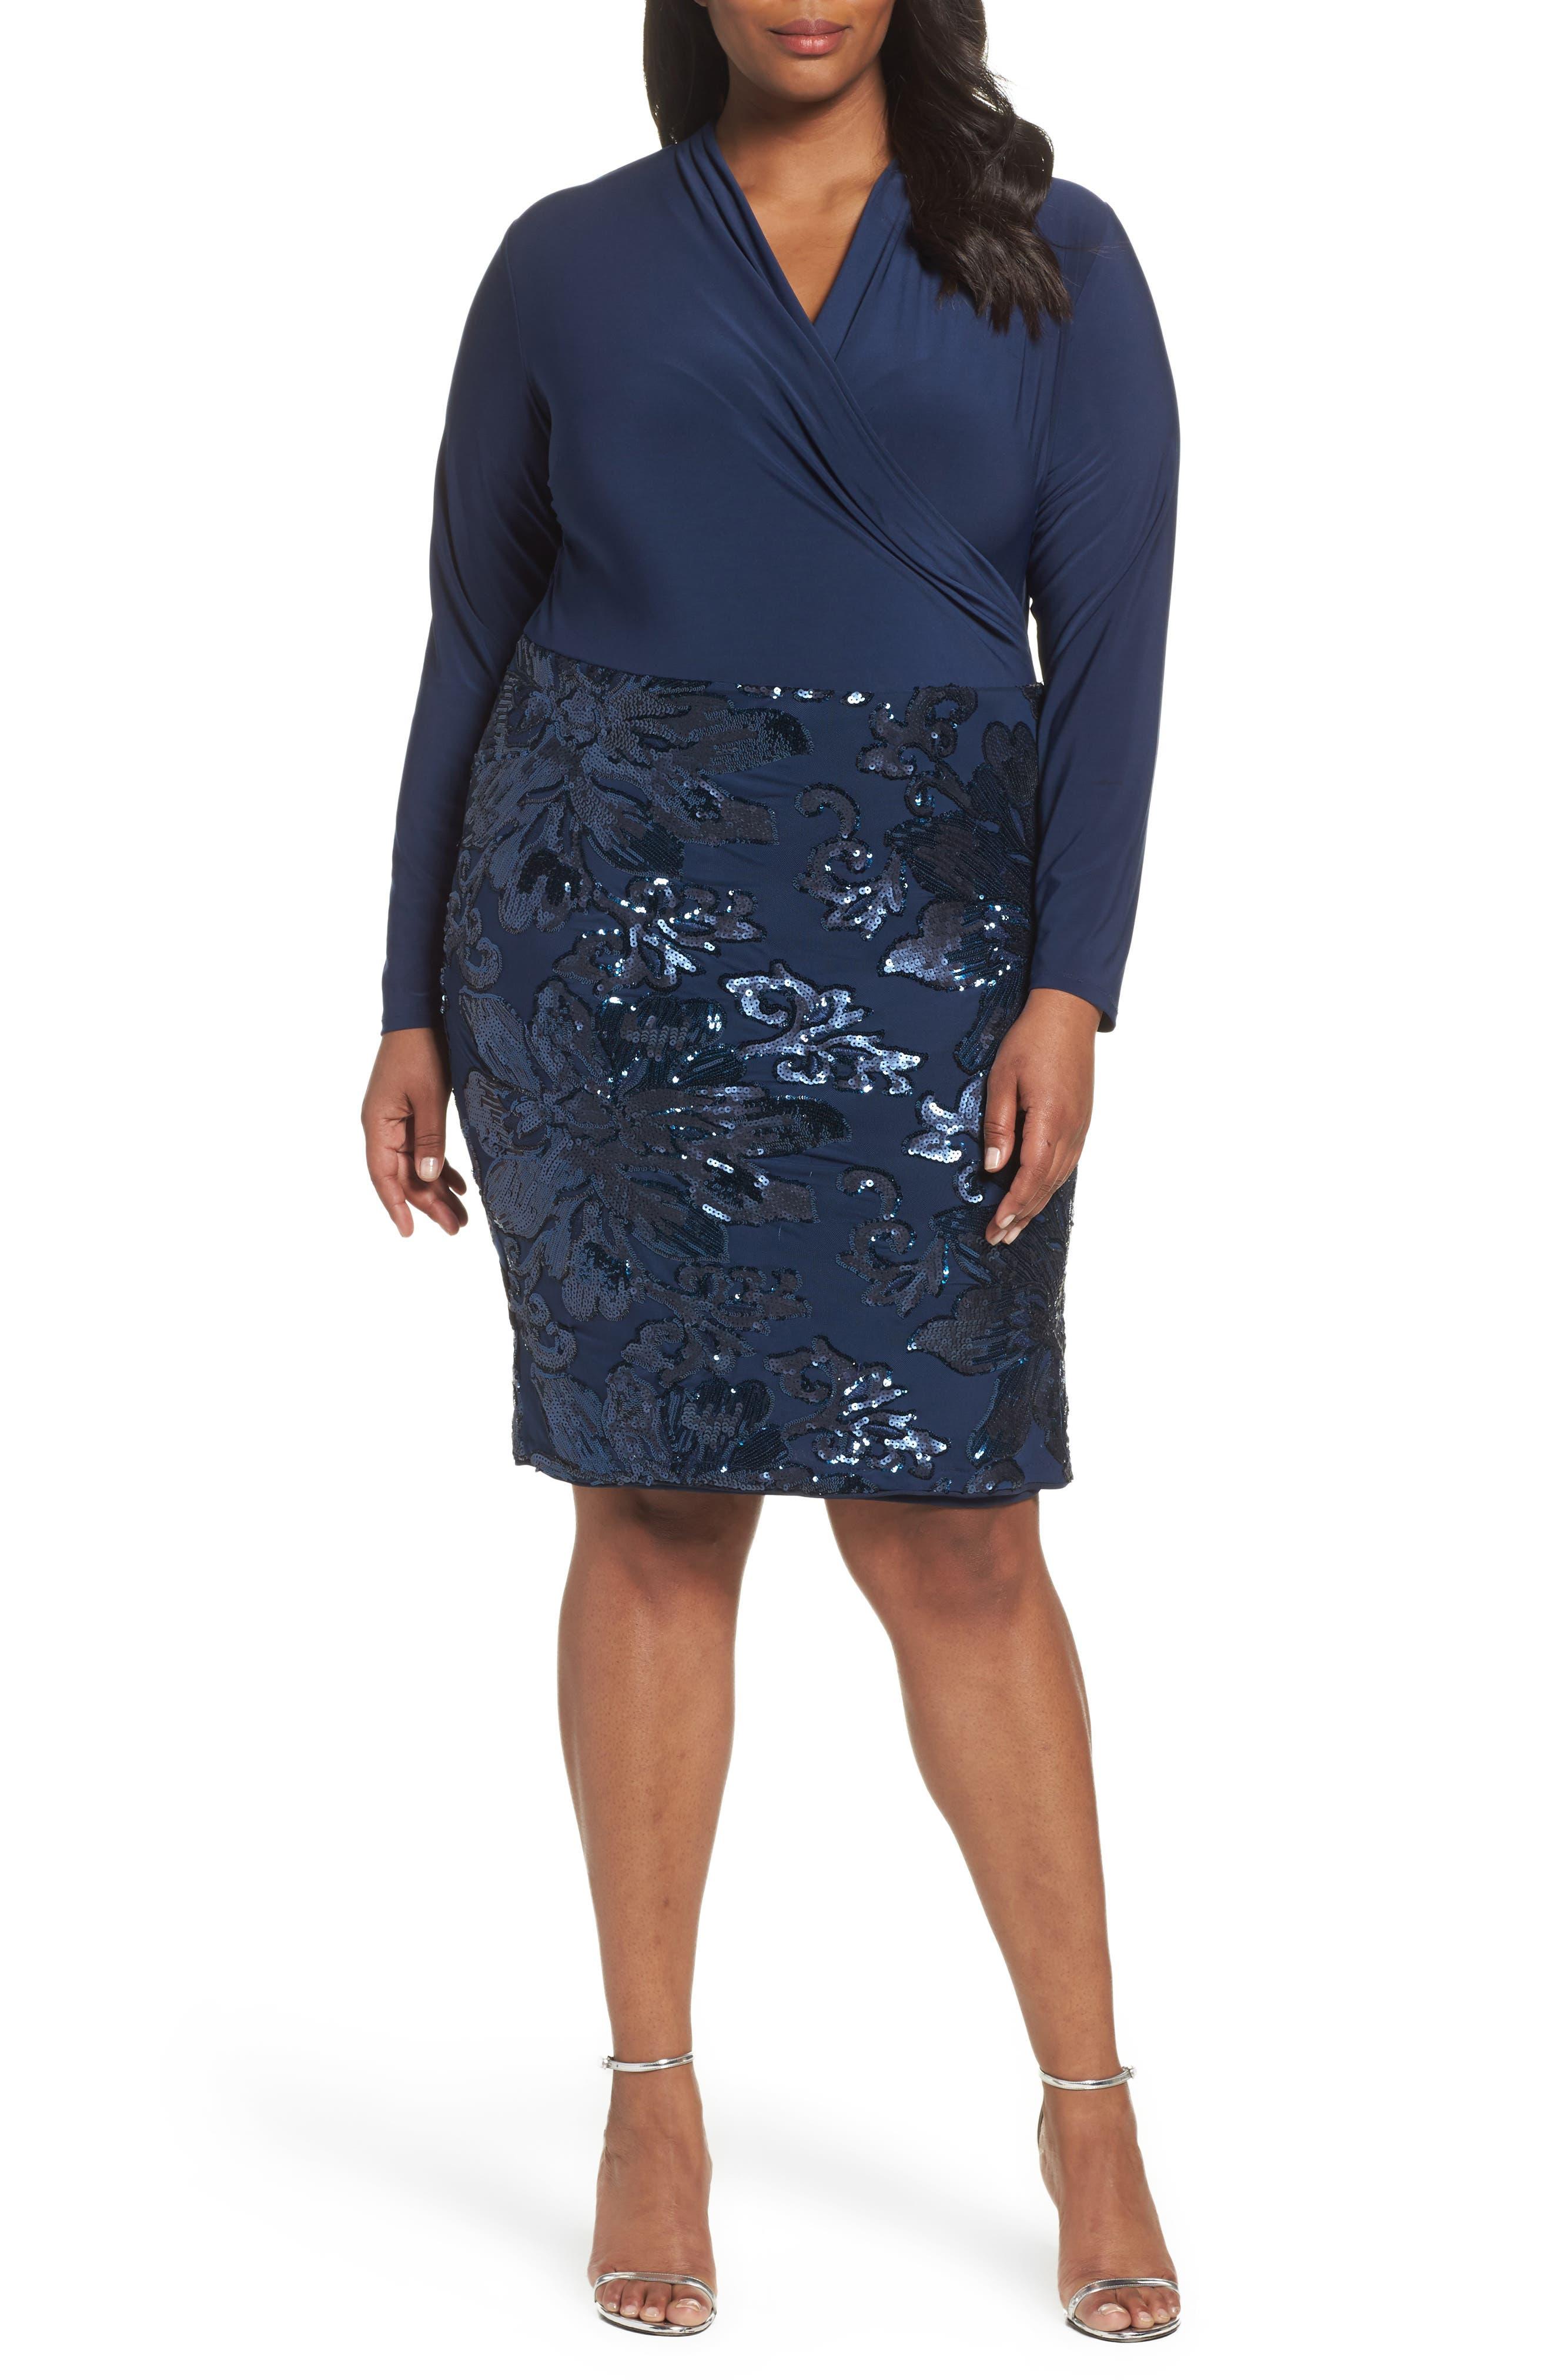 Alternate Image 1 Selected - Marina Sequin Faux Wrap Sheath Dress (Plus Size)